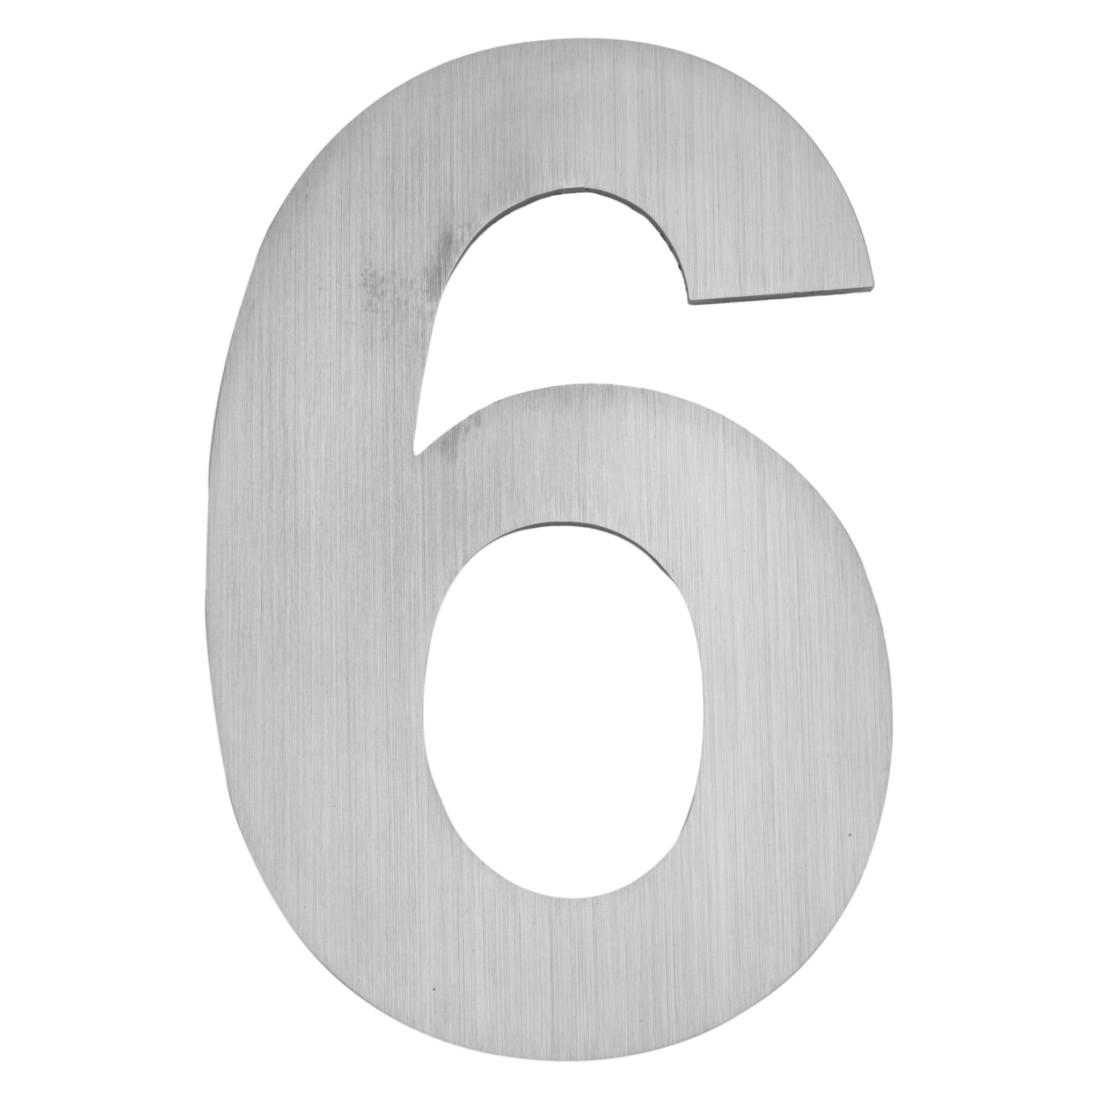 Hausnummer zum Aufschrauben 6 - Matt Gebürstet Edelstahl Matt Gebürstet Silber, Serafini